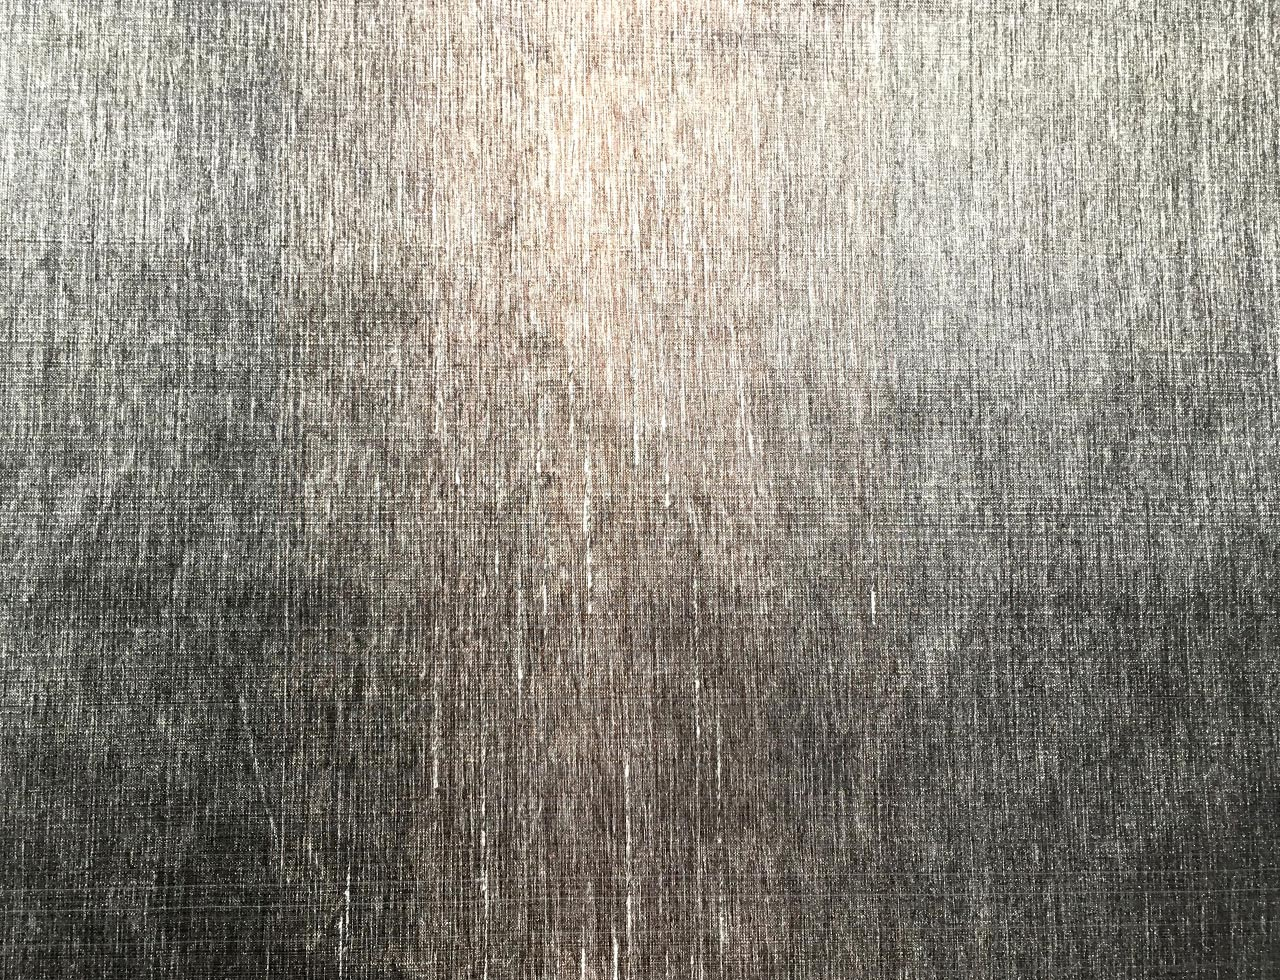 inmatex tejido hogar enrollable rayas colores degradé